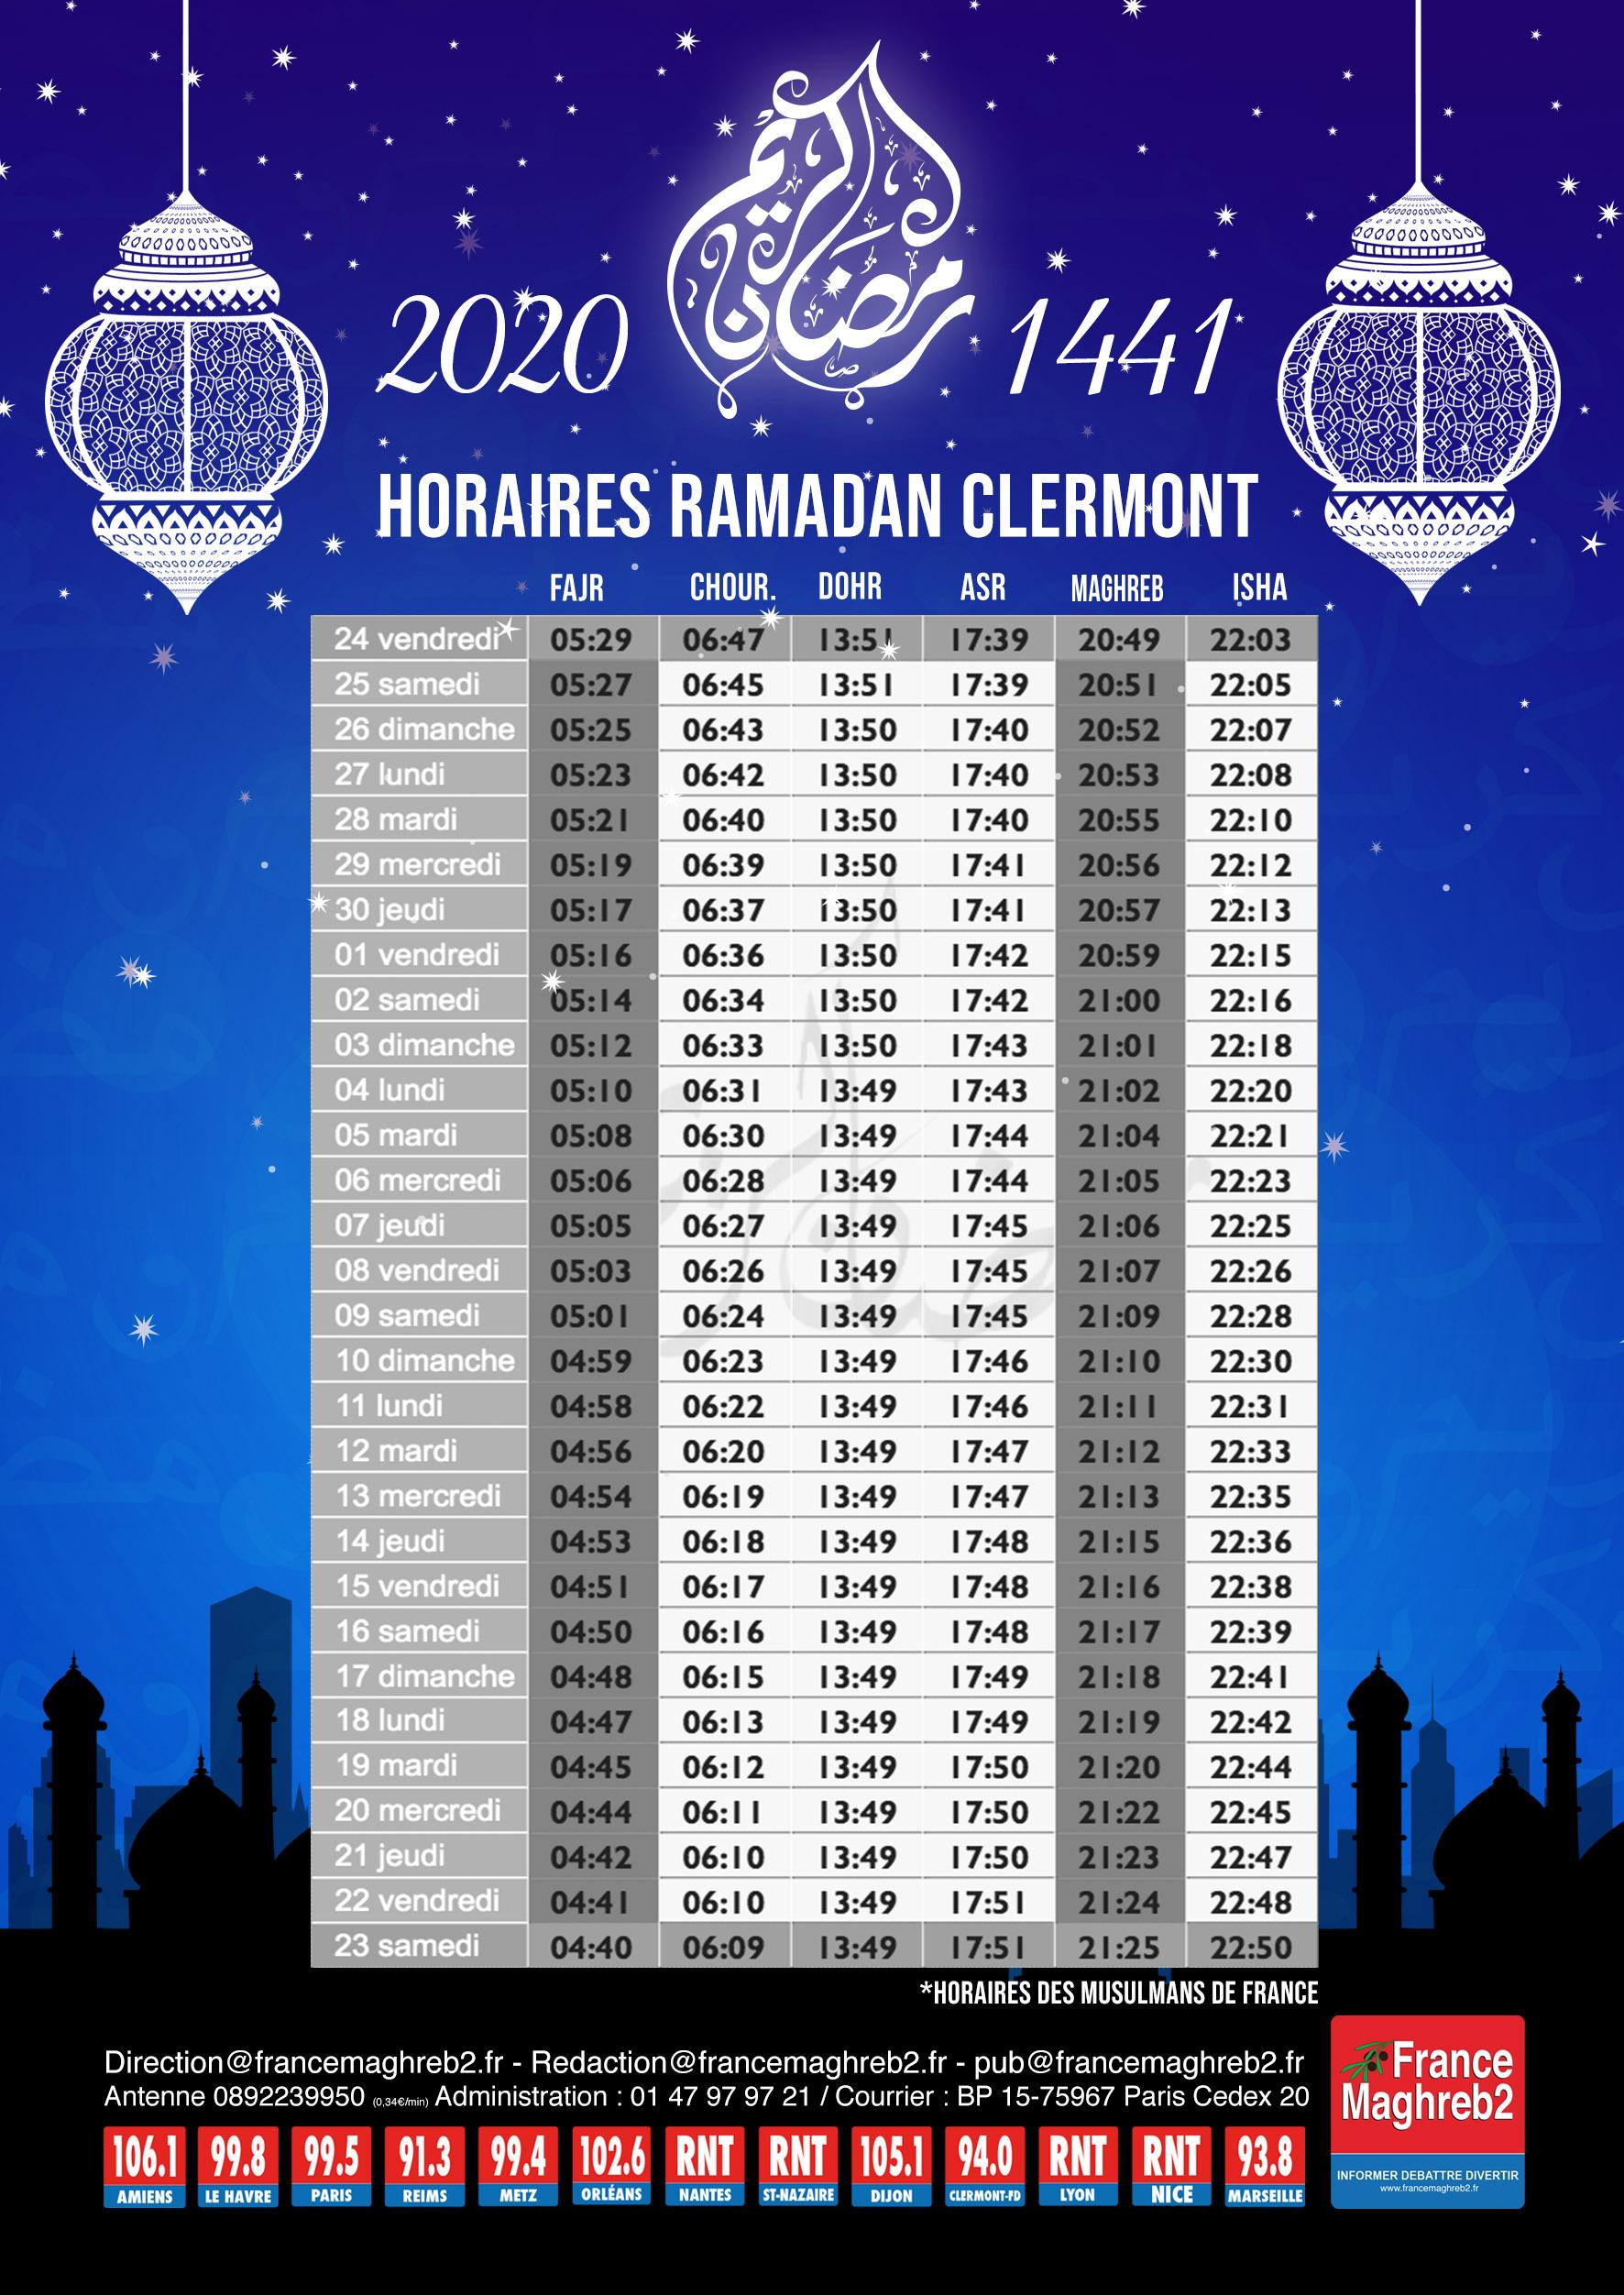 Calendrier Ramadan 2021 Horaire Paris Horaires Ramadan 2020   France Maghreb 2